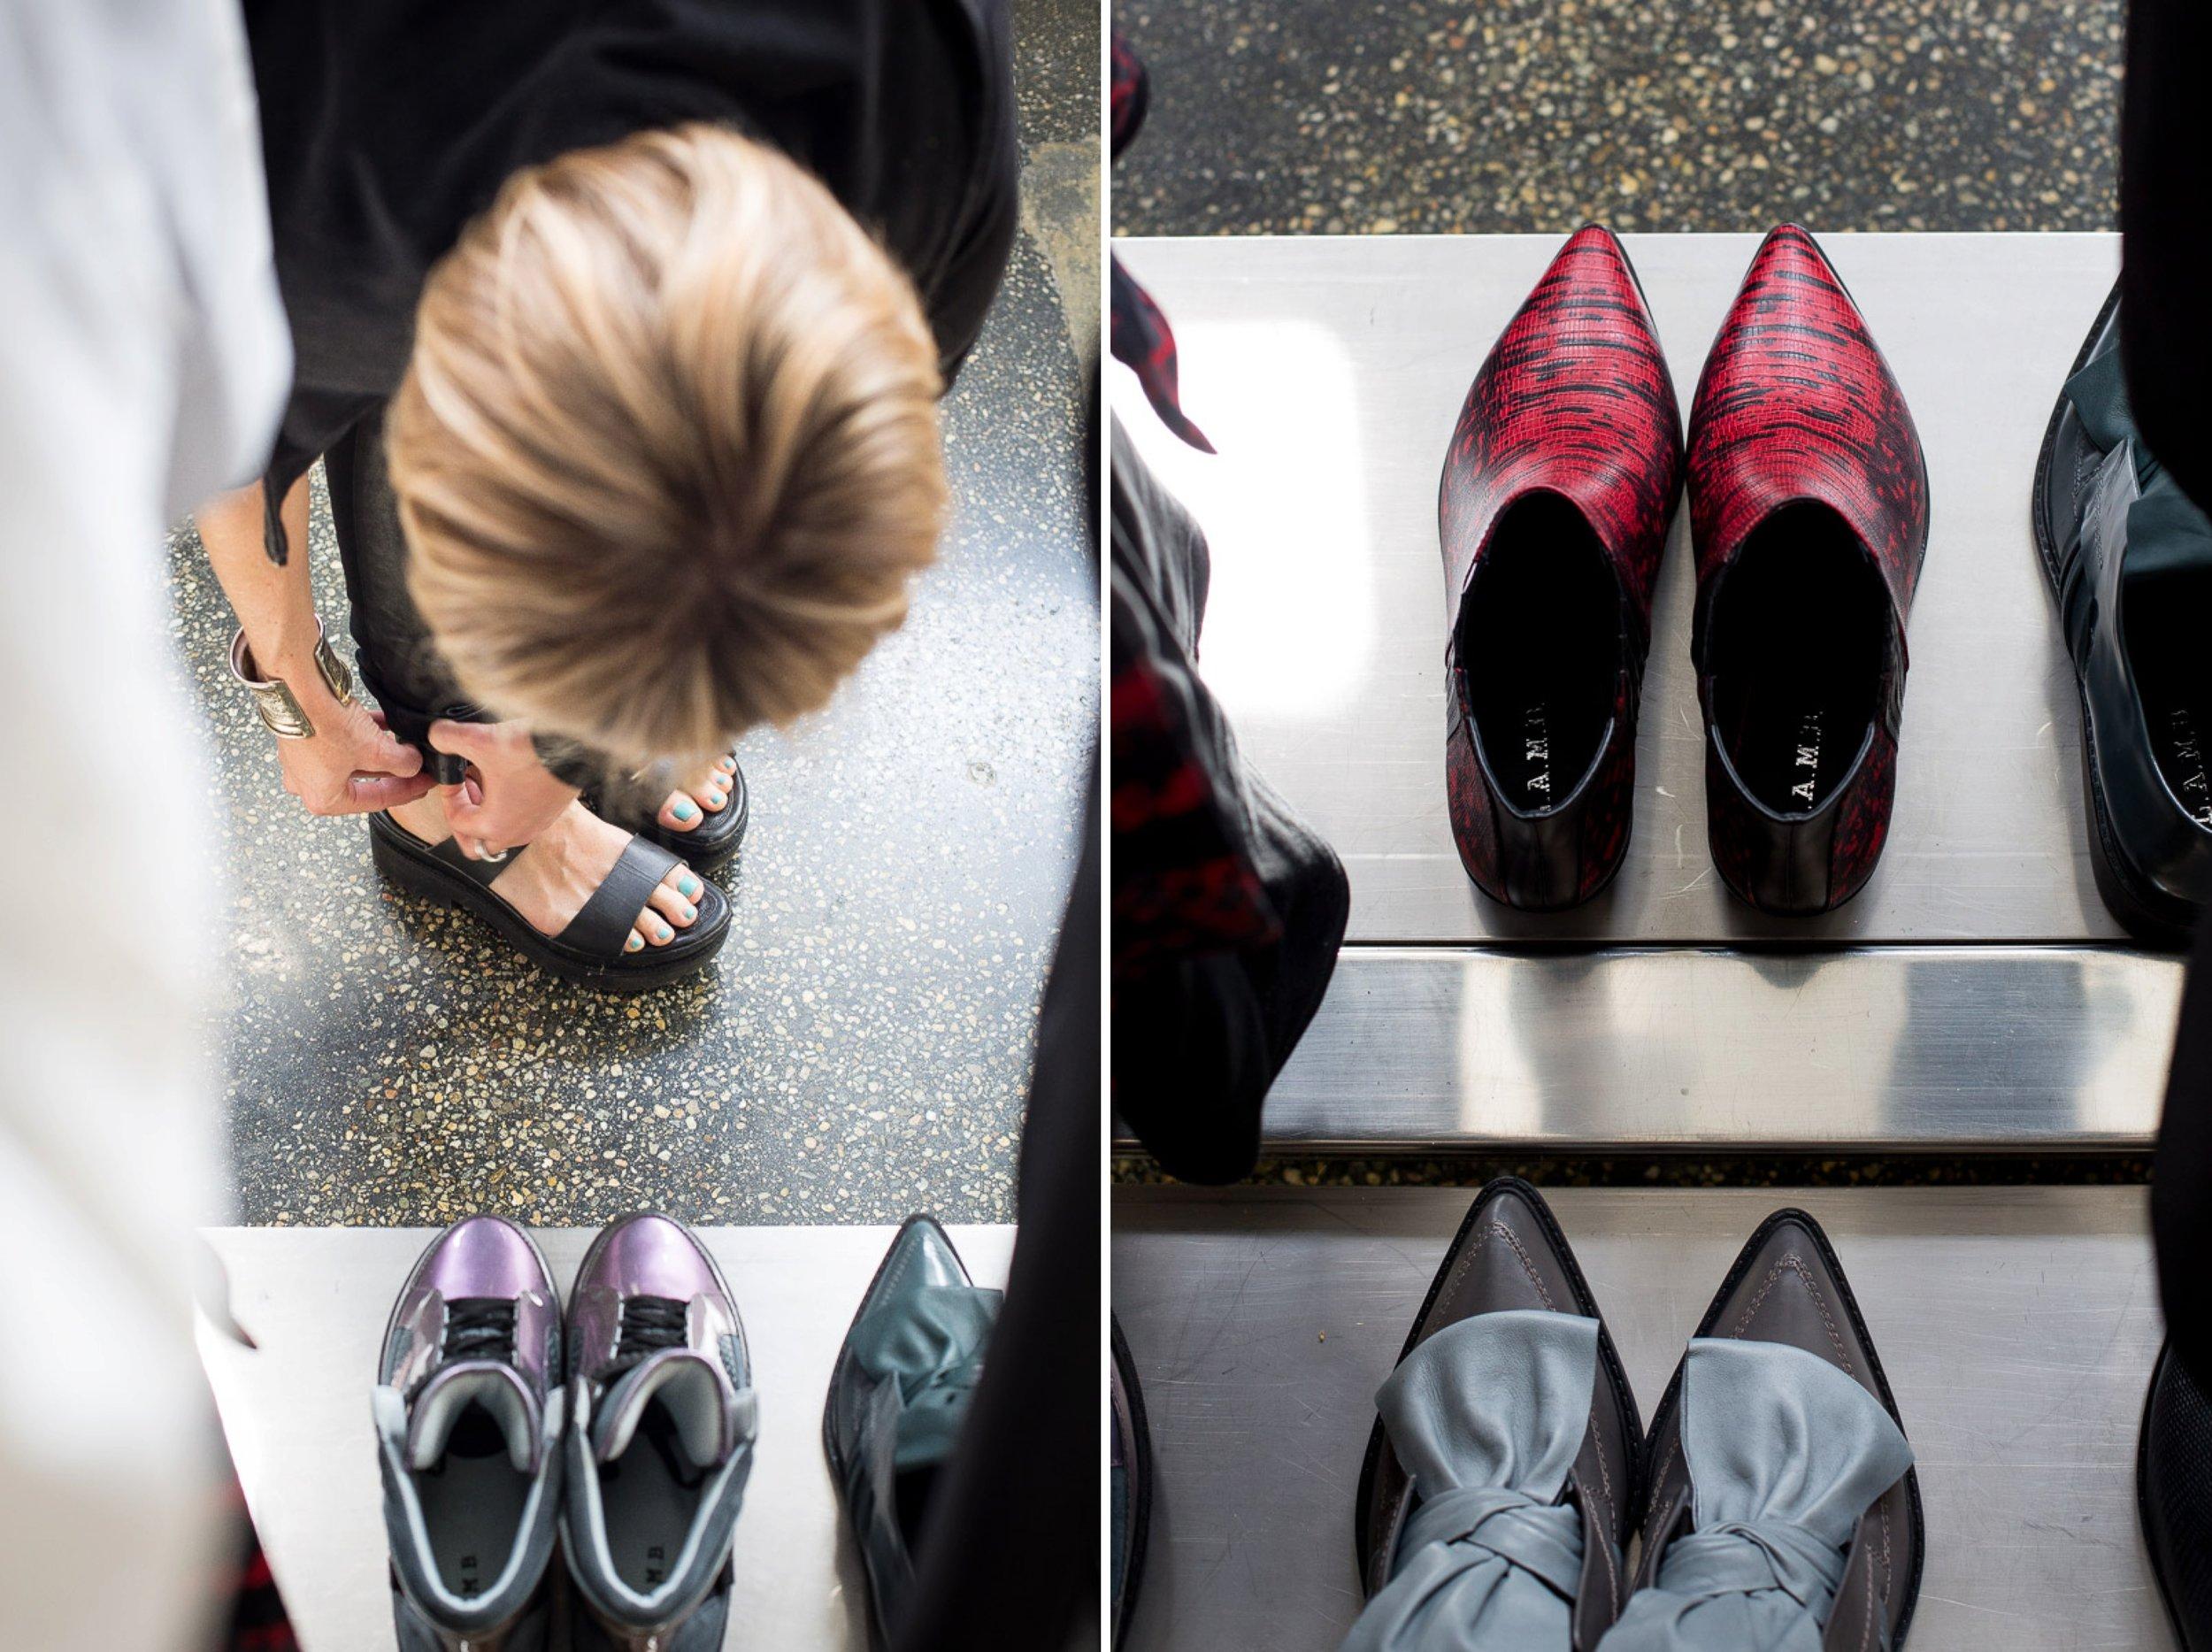 lamb-gwen-stefani-shoe-collection.jpg